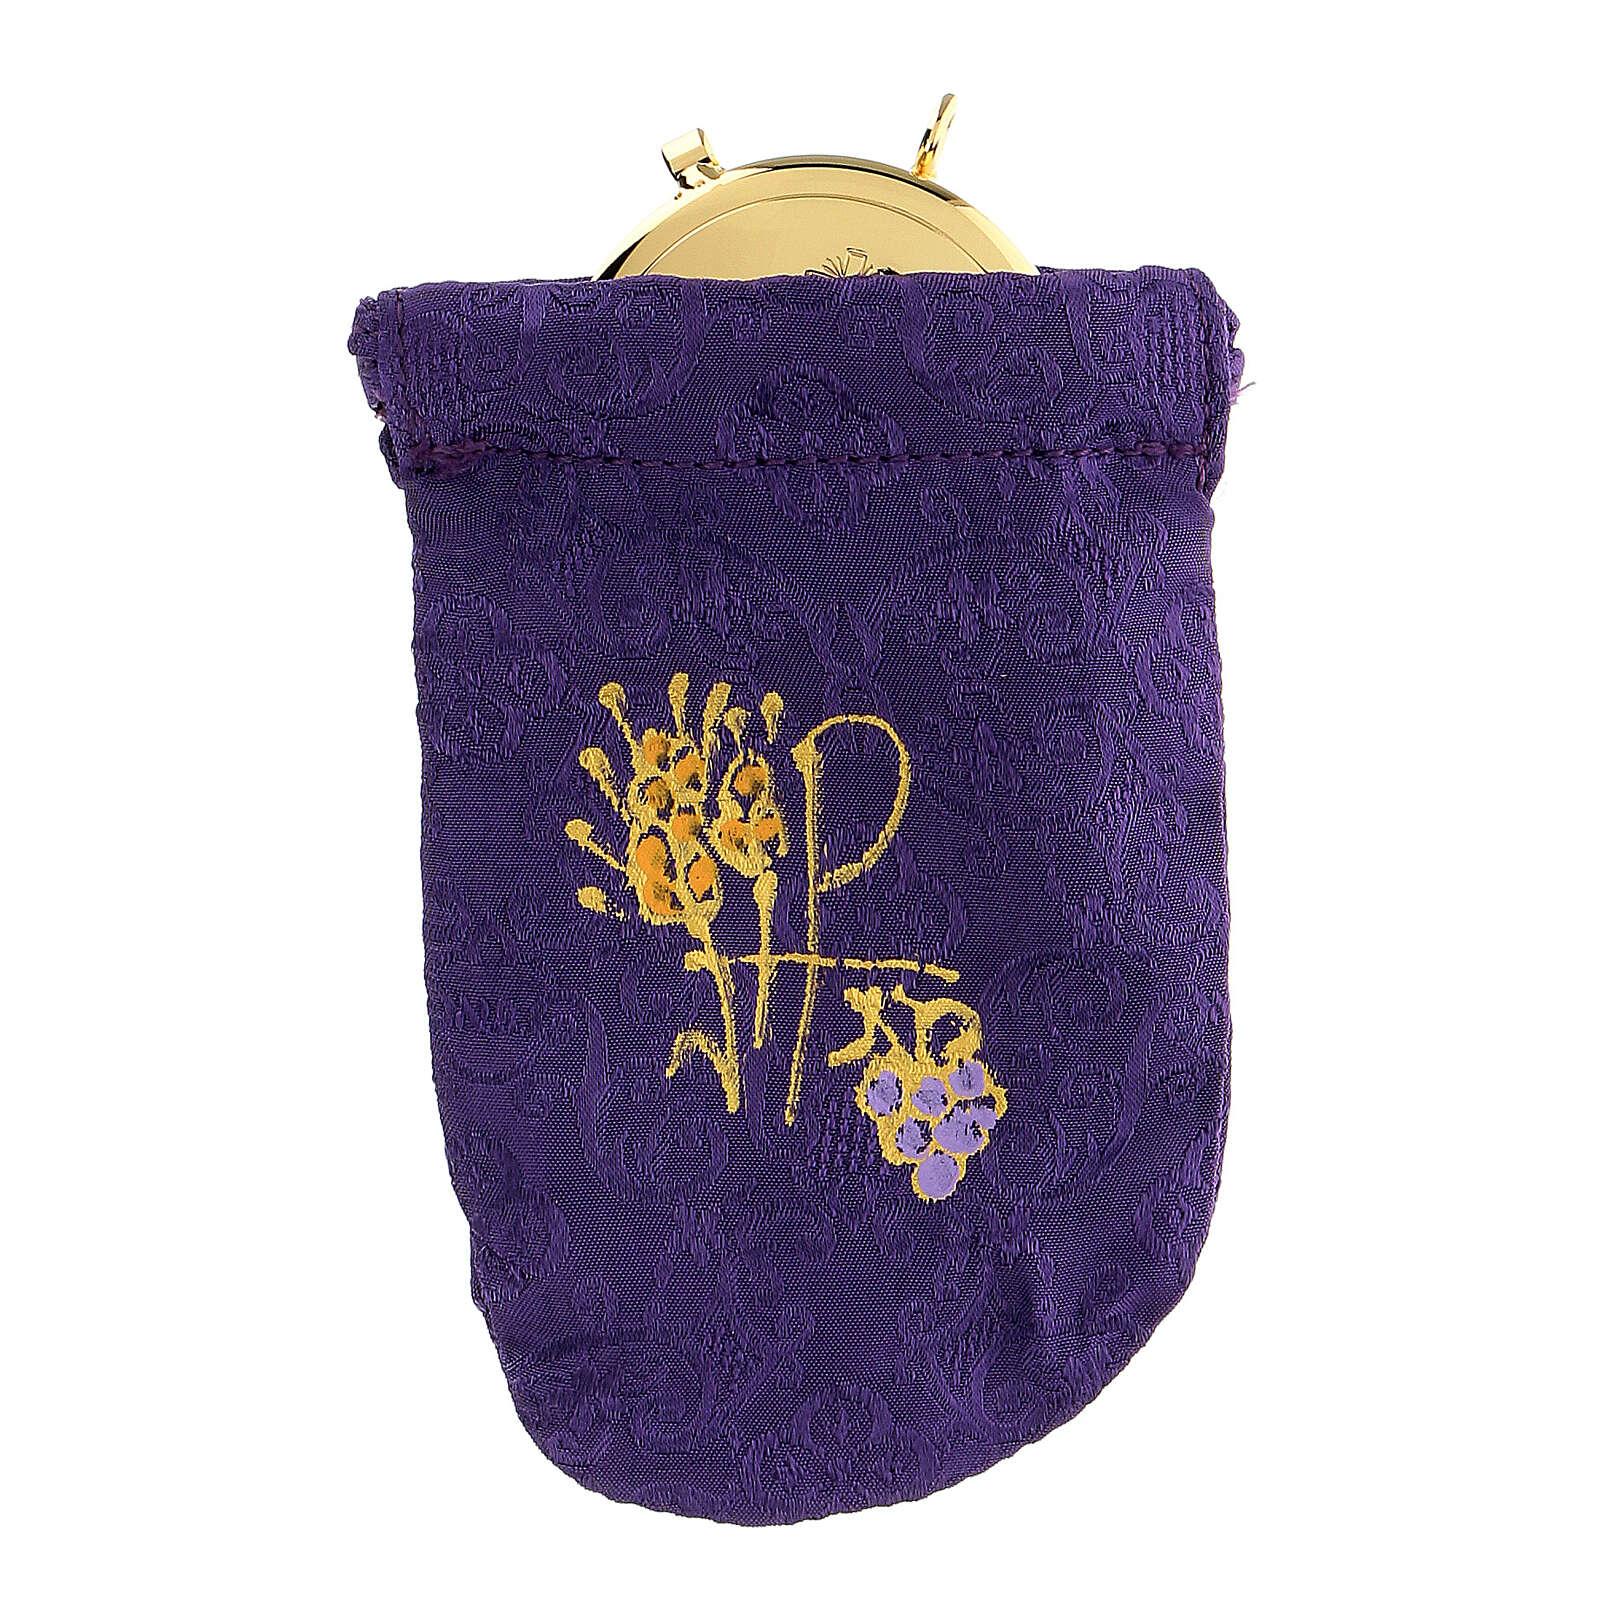 Sacchetto porta teca violain jacquard teca 8 cm 3